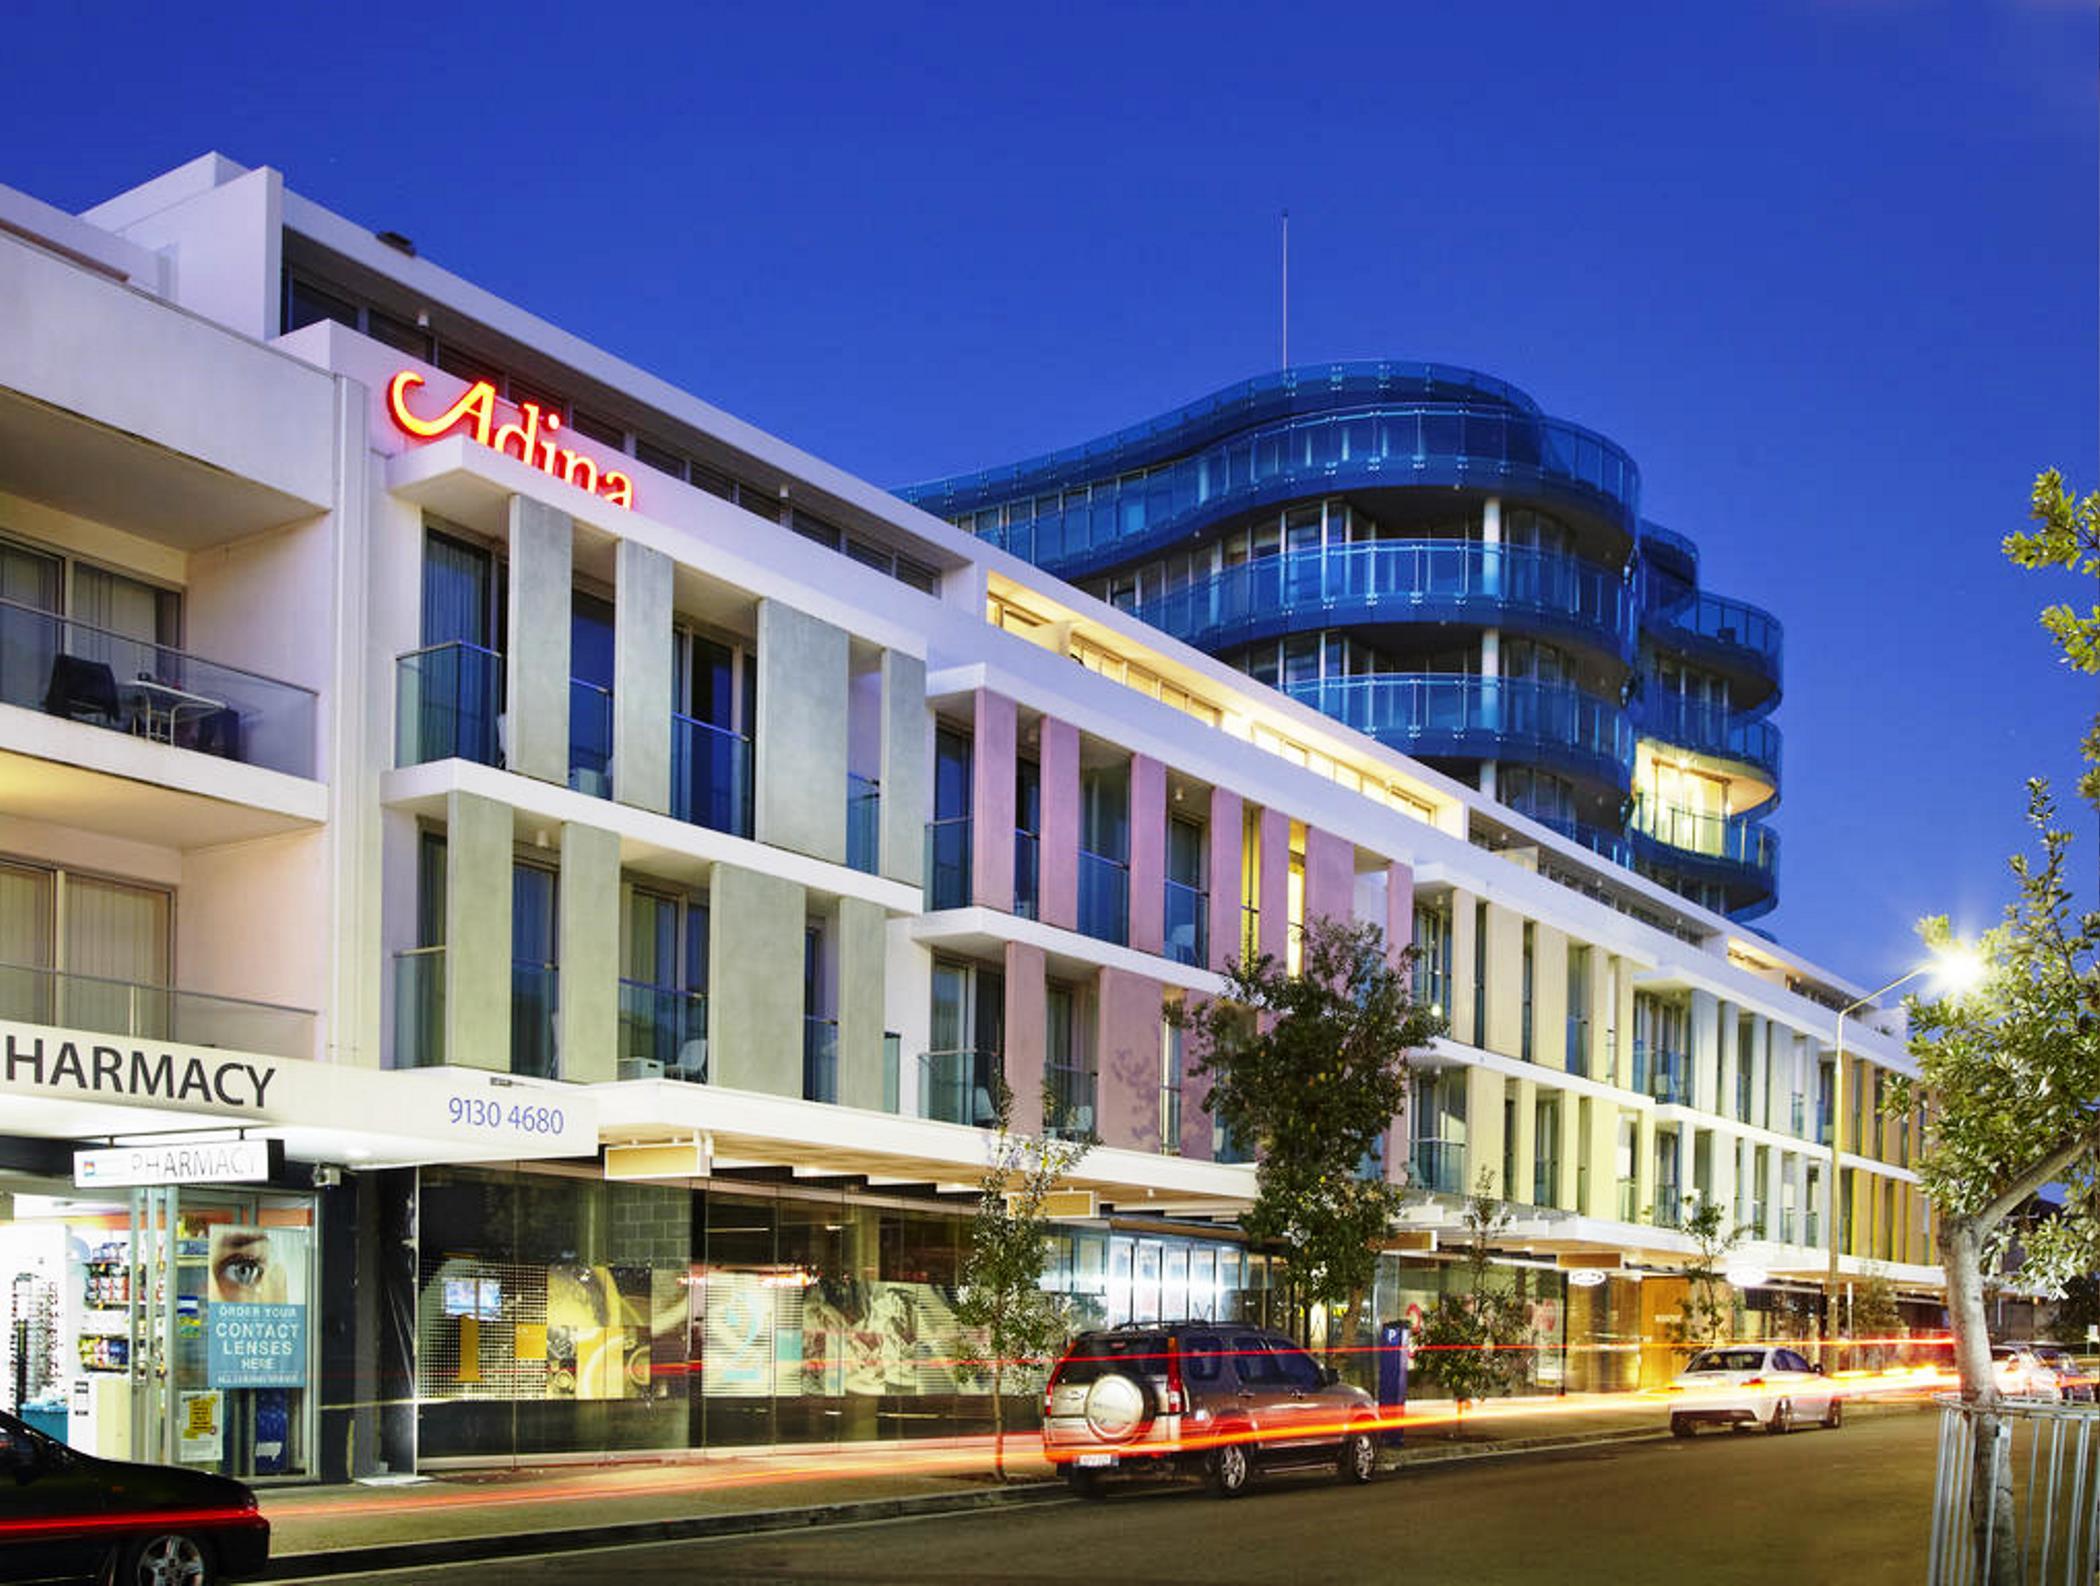 Adina Apartment Hotel Bondi Beach Sydney, Waverley